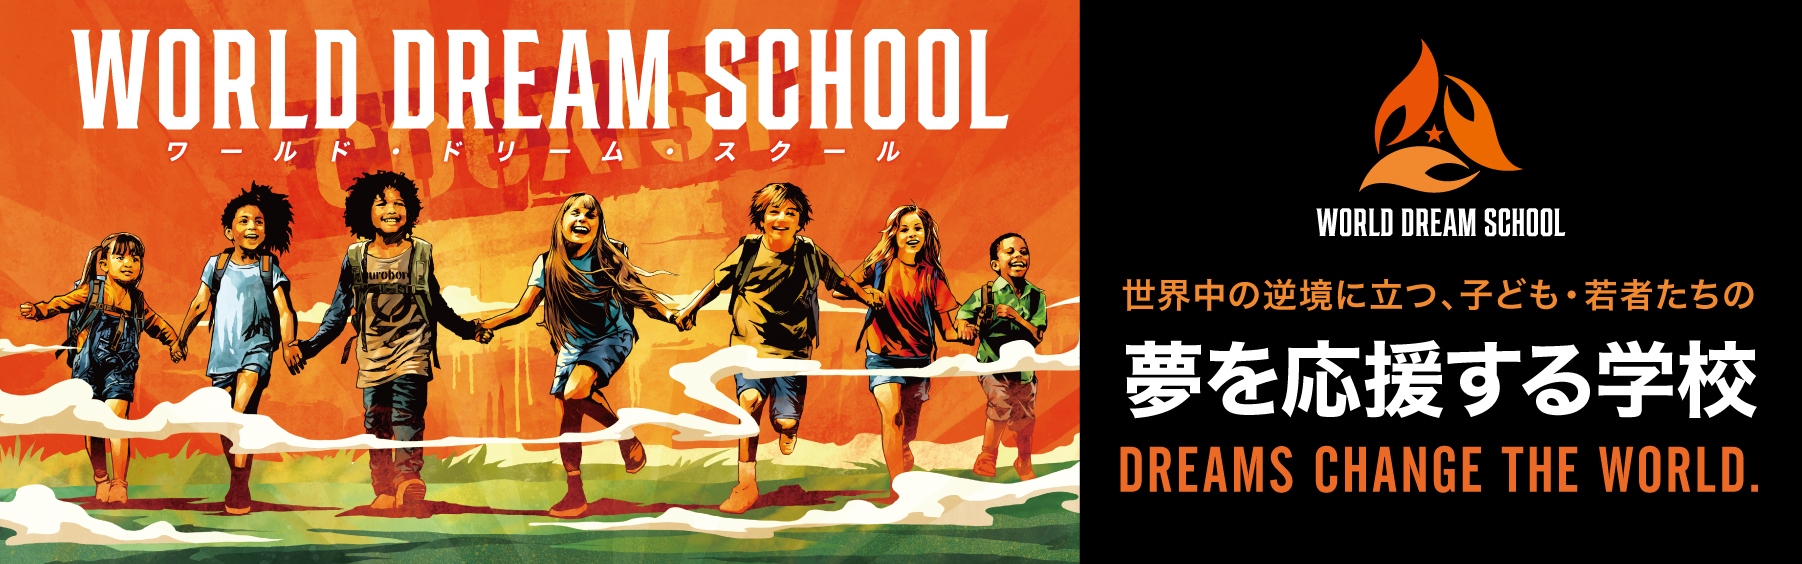 WORLD DREAM SCHOOL